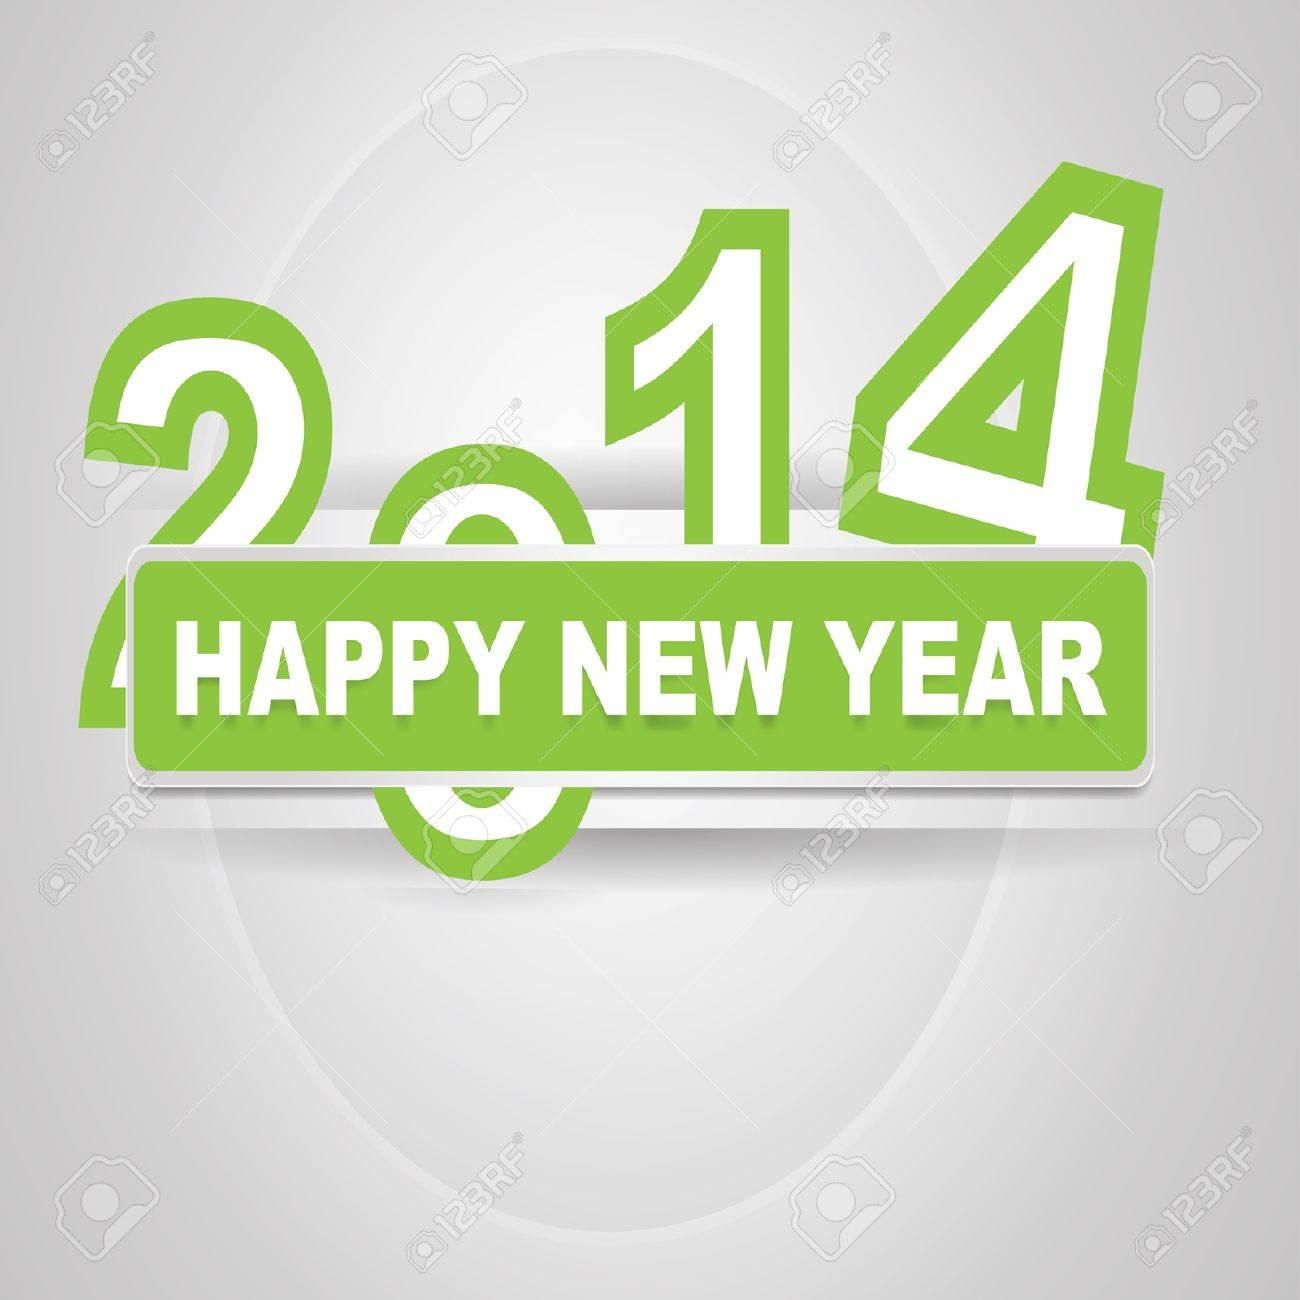 Happy New Year - 24366480